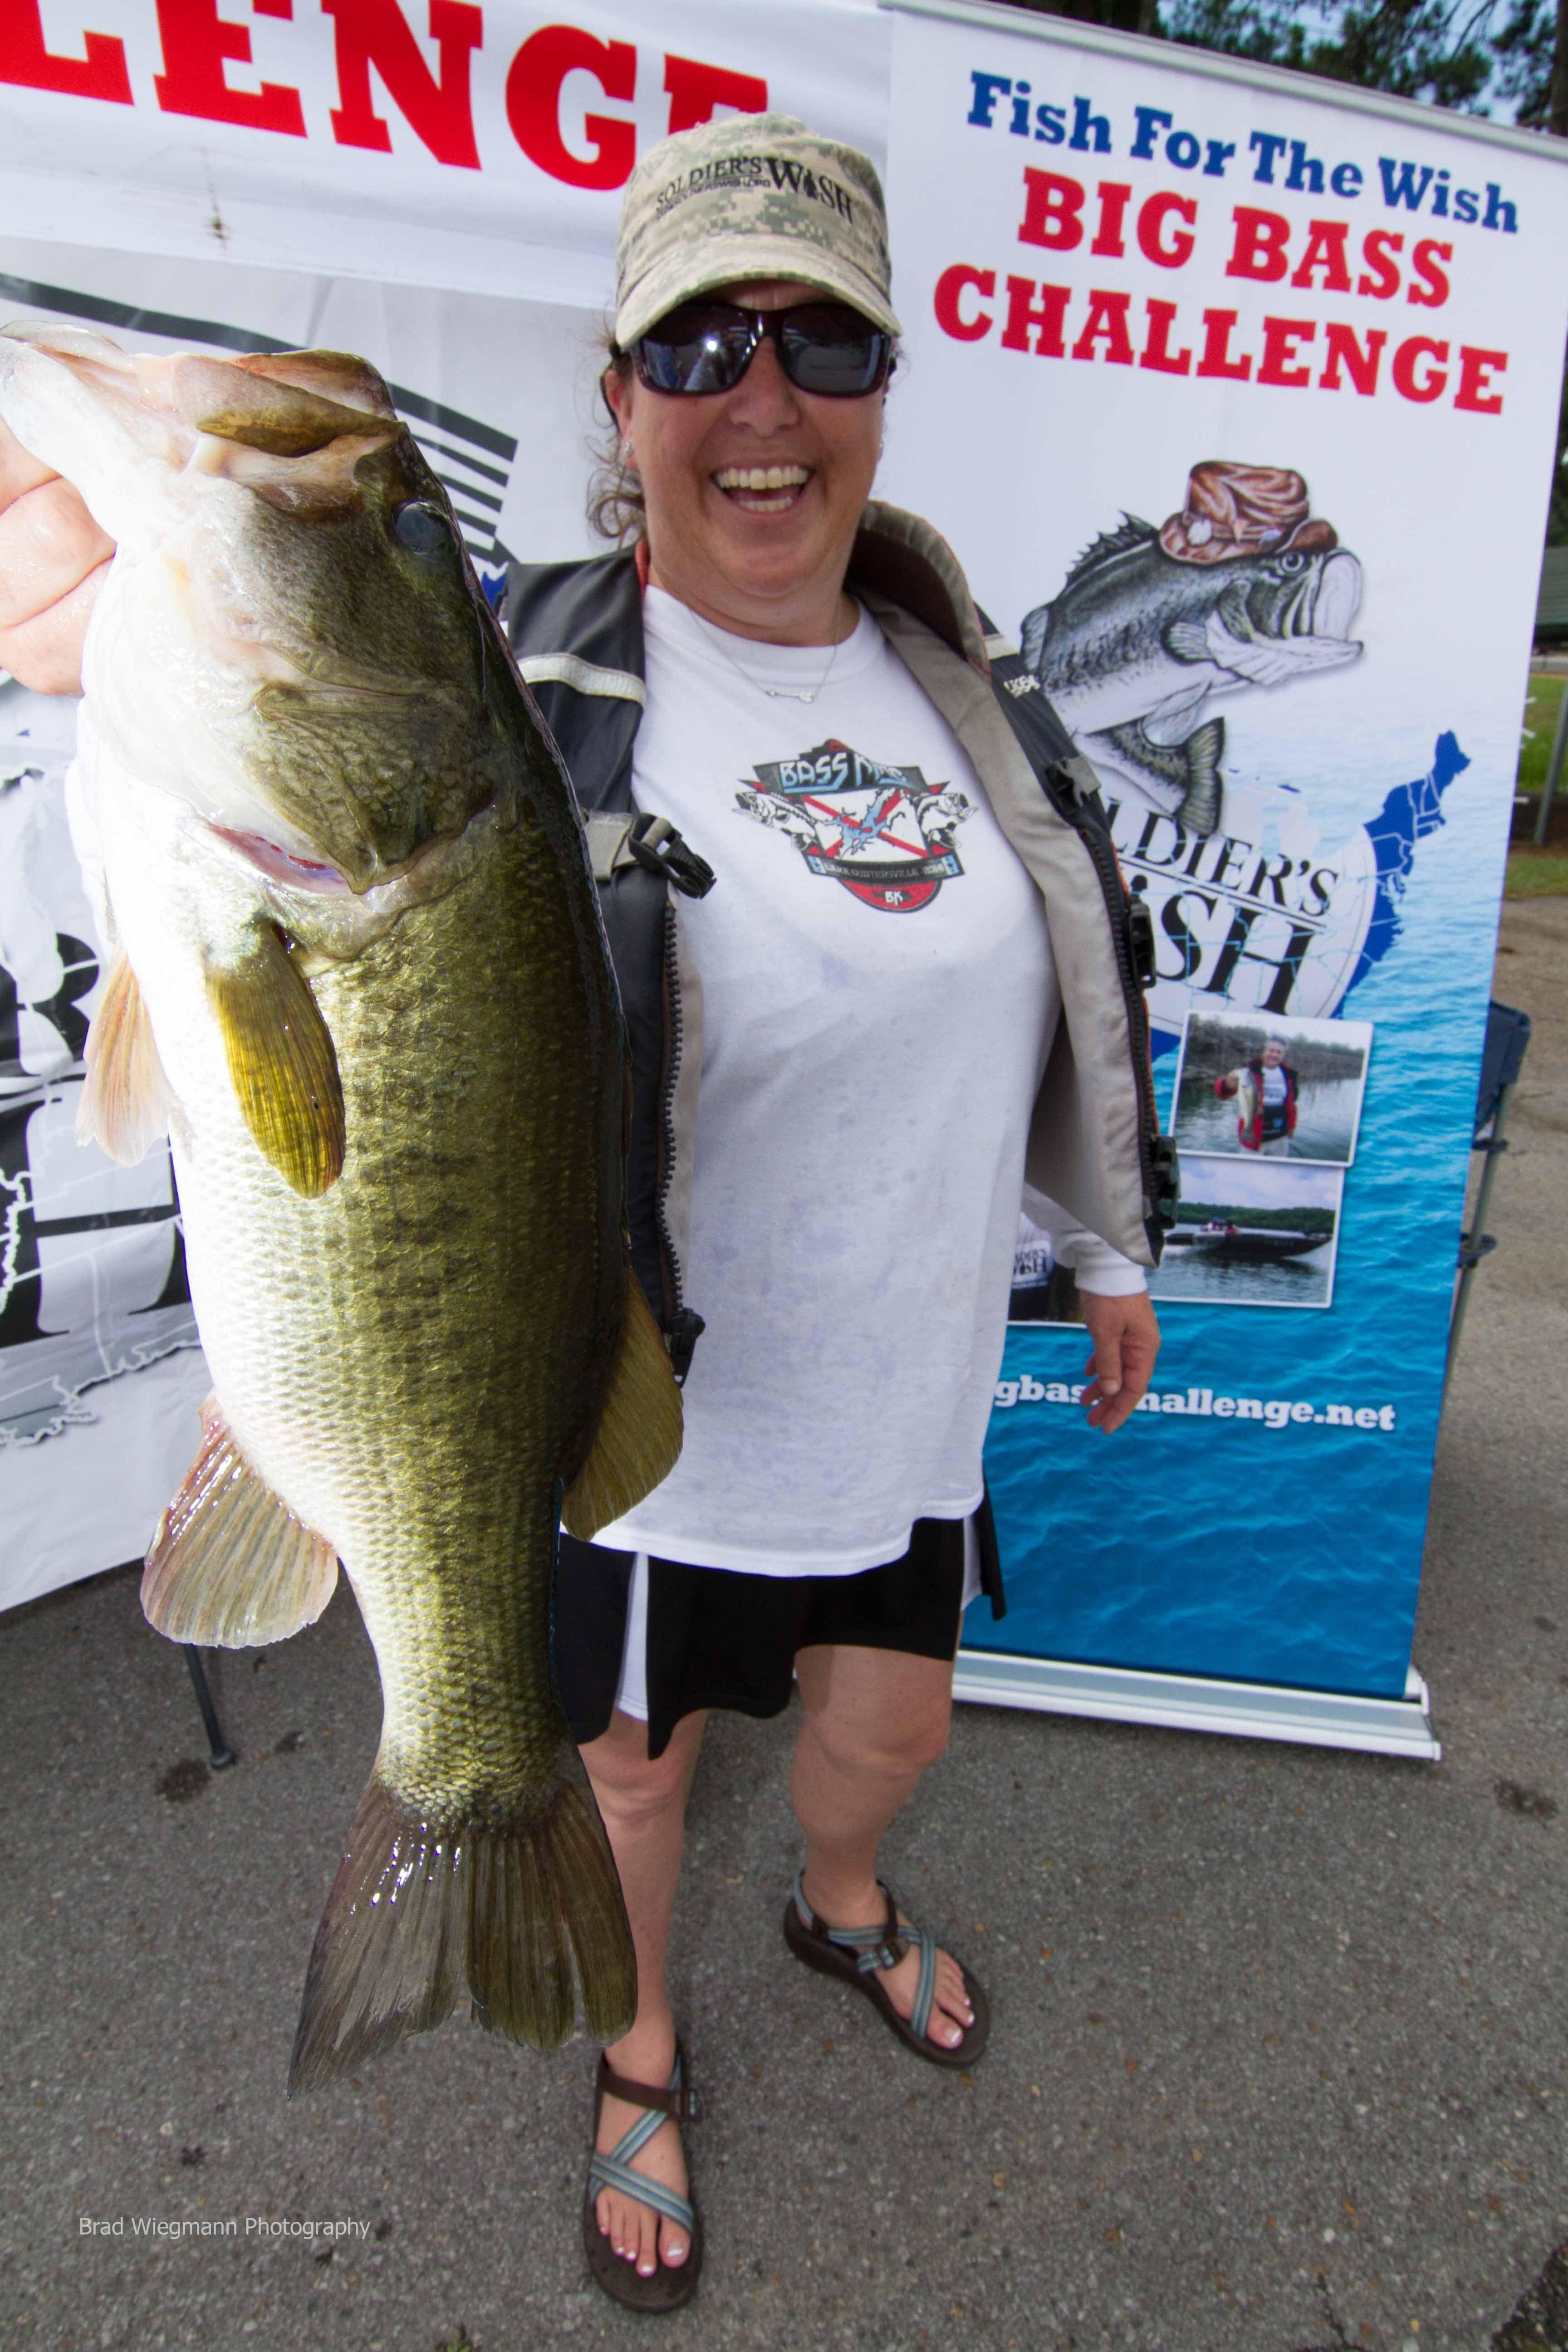 Fish For The Wish Big Bass Challenge Lake Chickamauga Dayton Tennessee Chickamauga Gone Fishing Fish